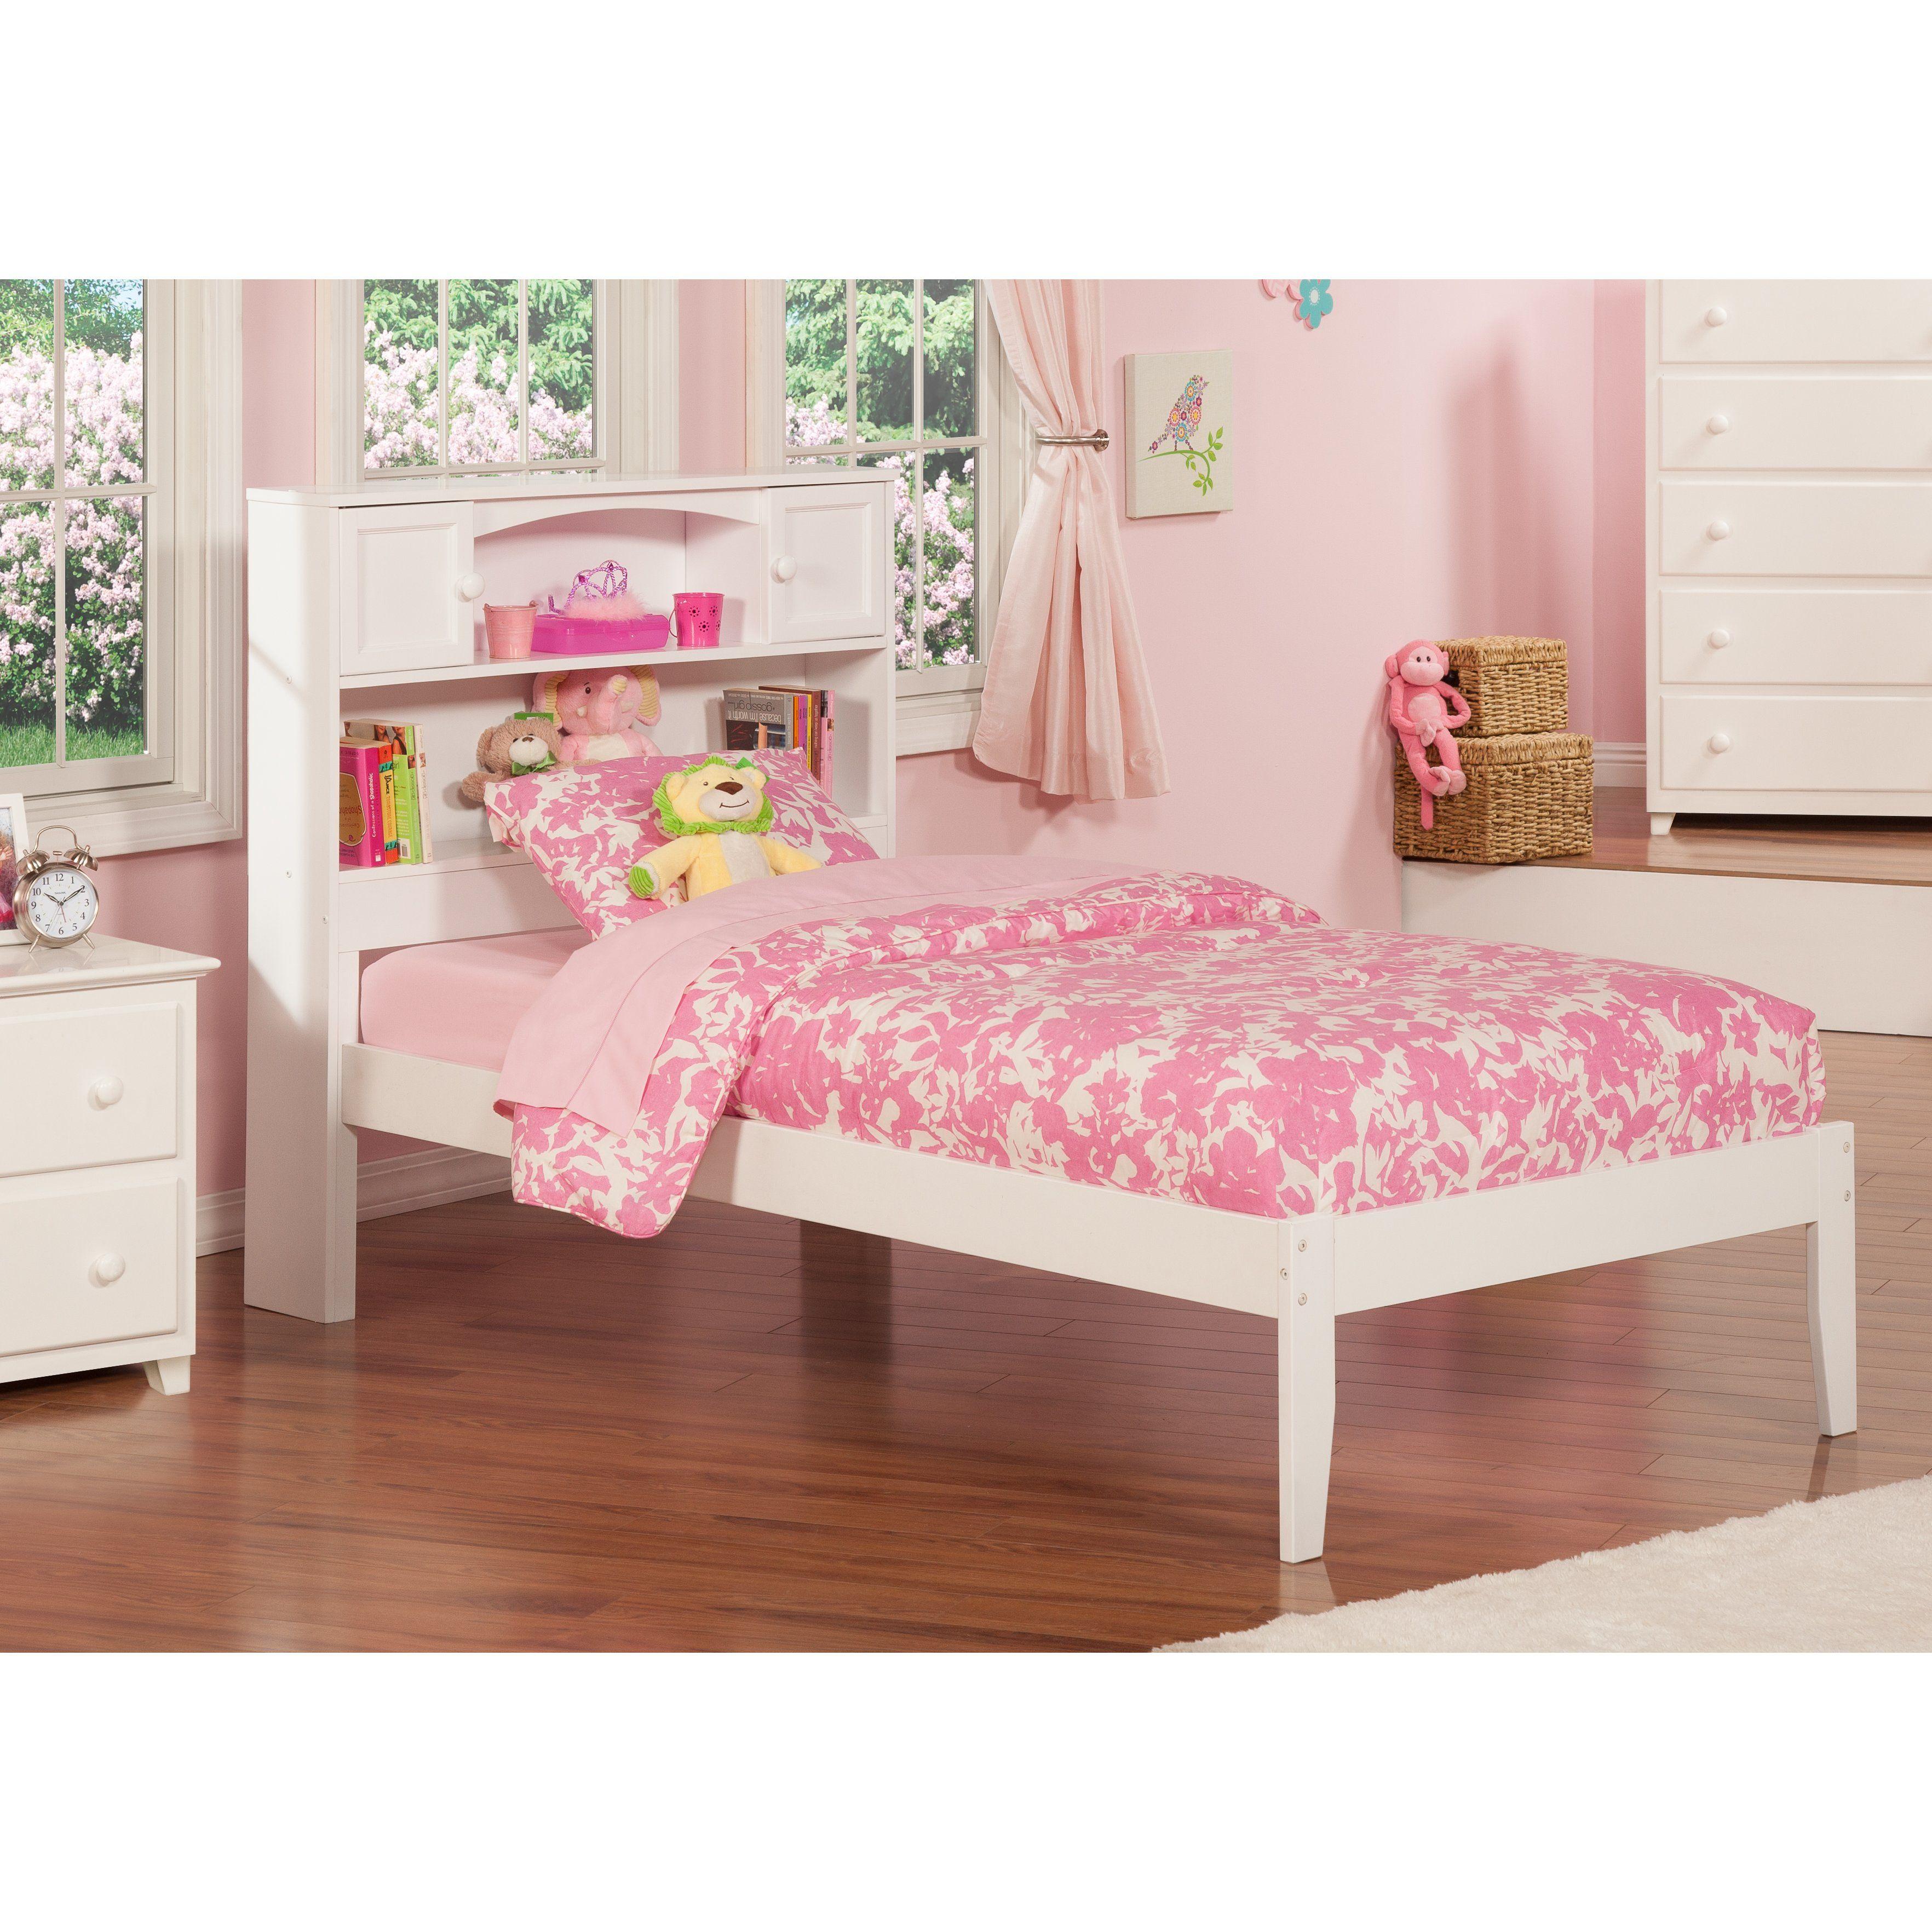 Wasilewski Platform Bed with Bookcase Atlantic furniture